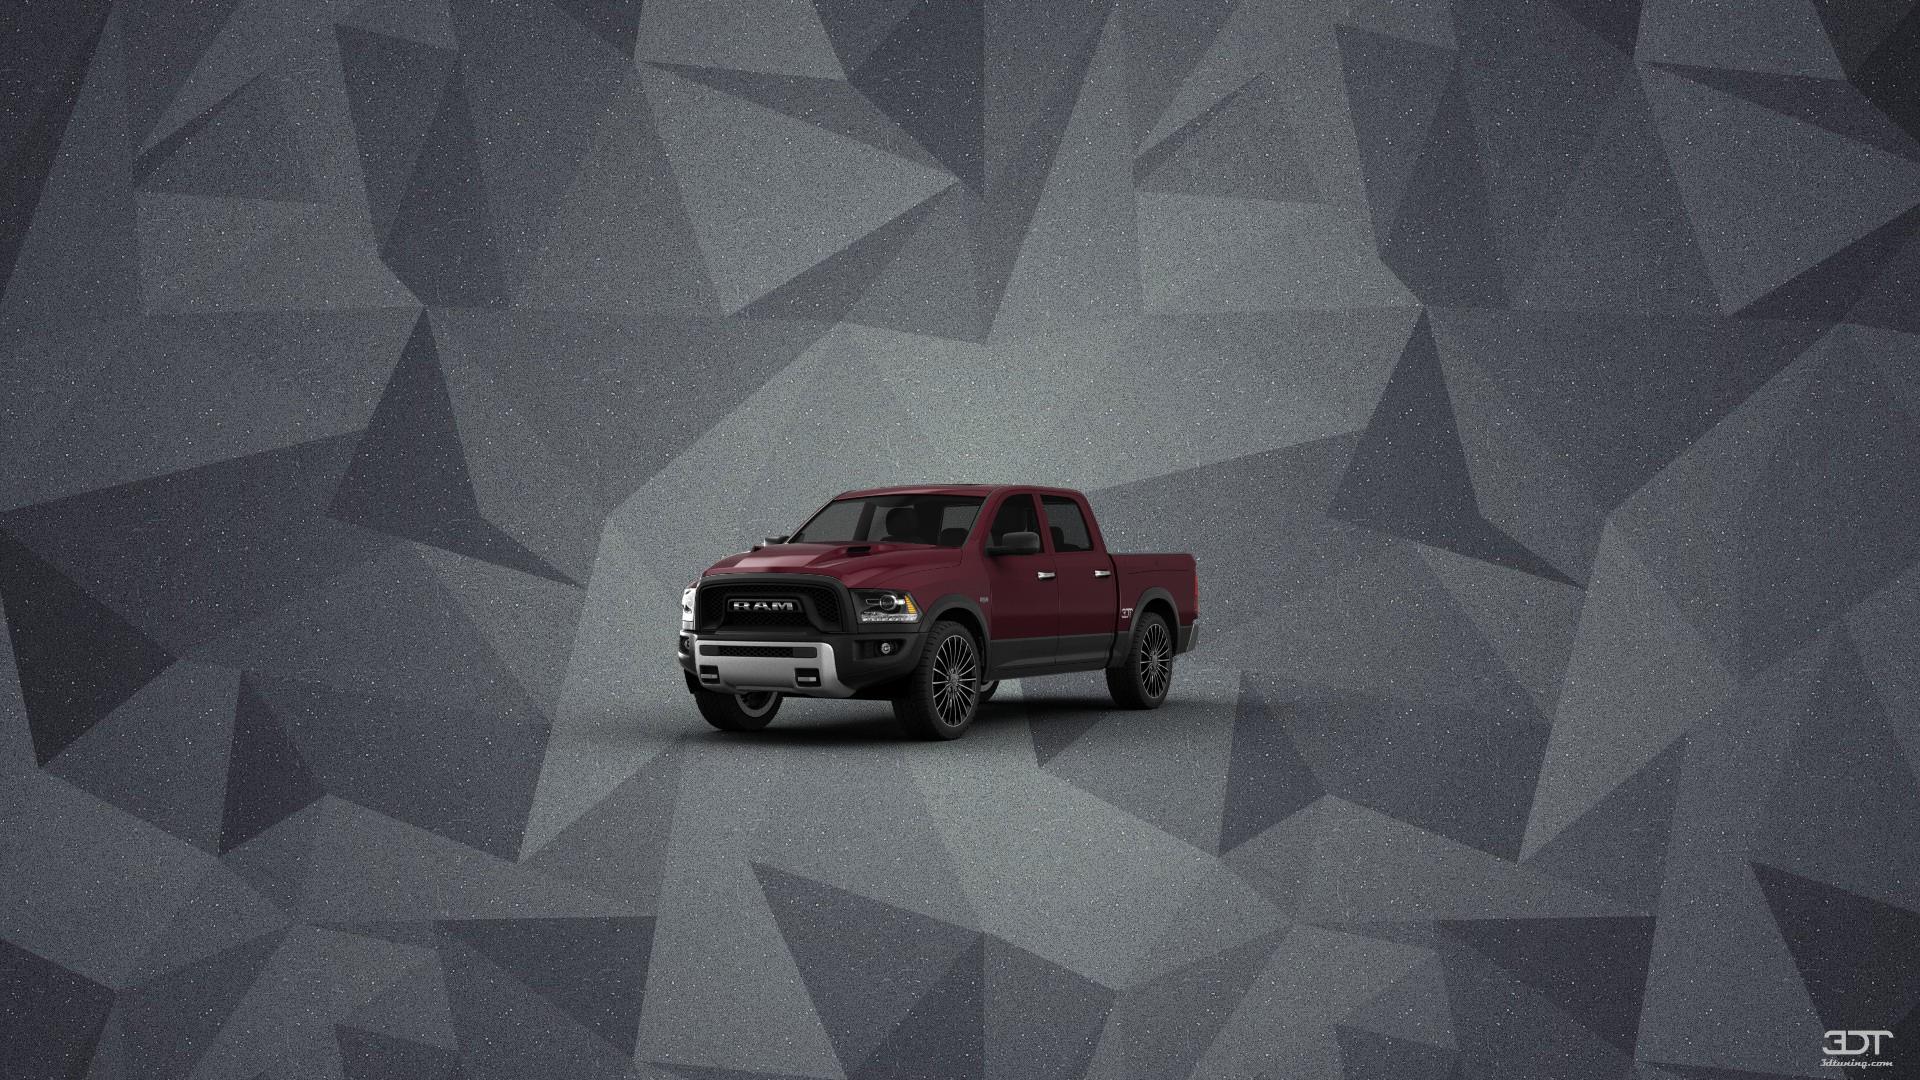 3dtuning Of Dodge Ram 2500 Crew Cab Truck 2114 3dtuning